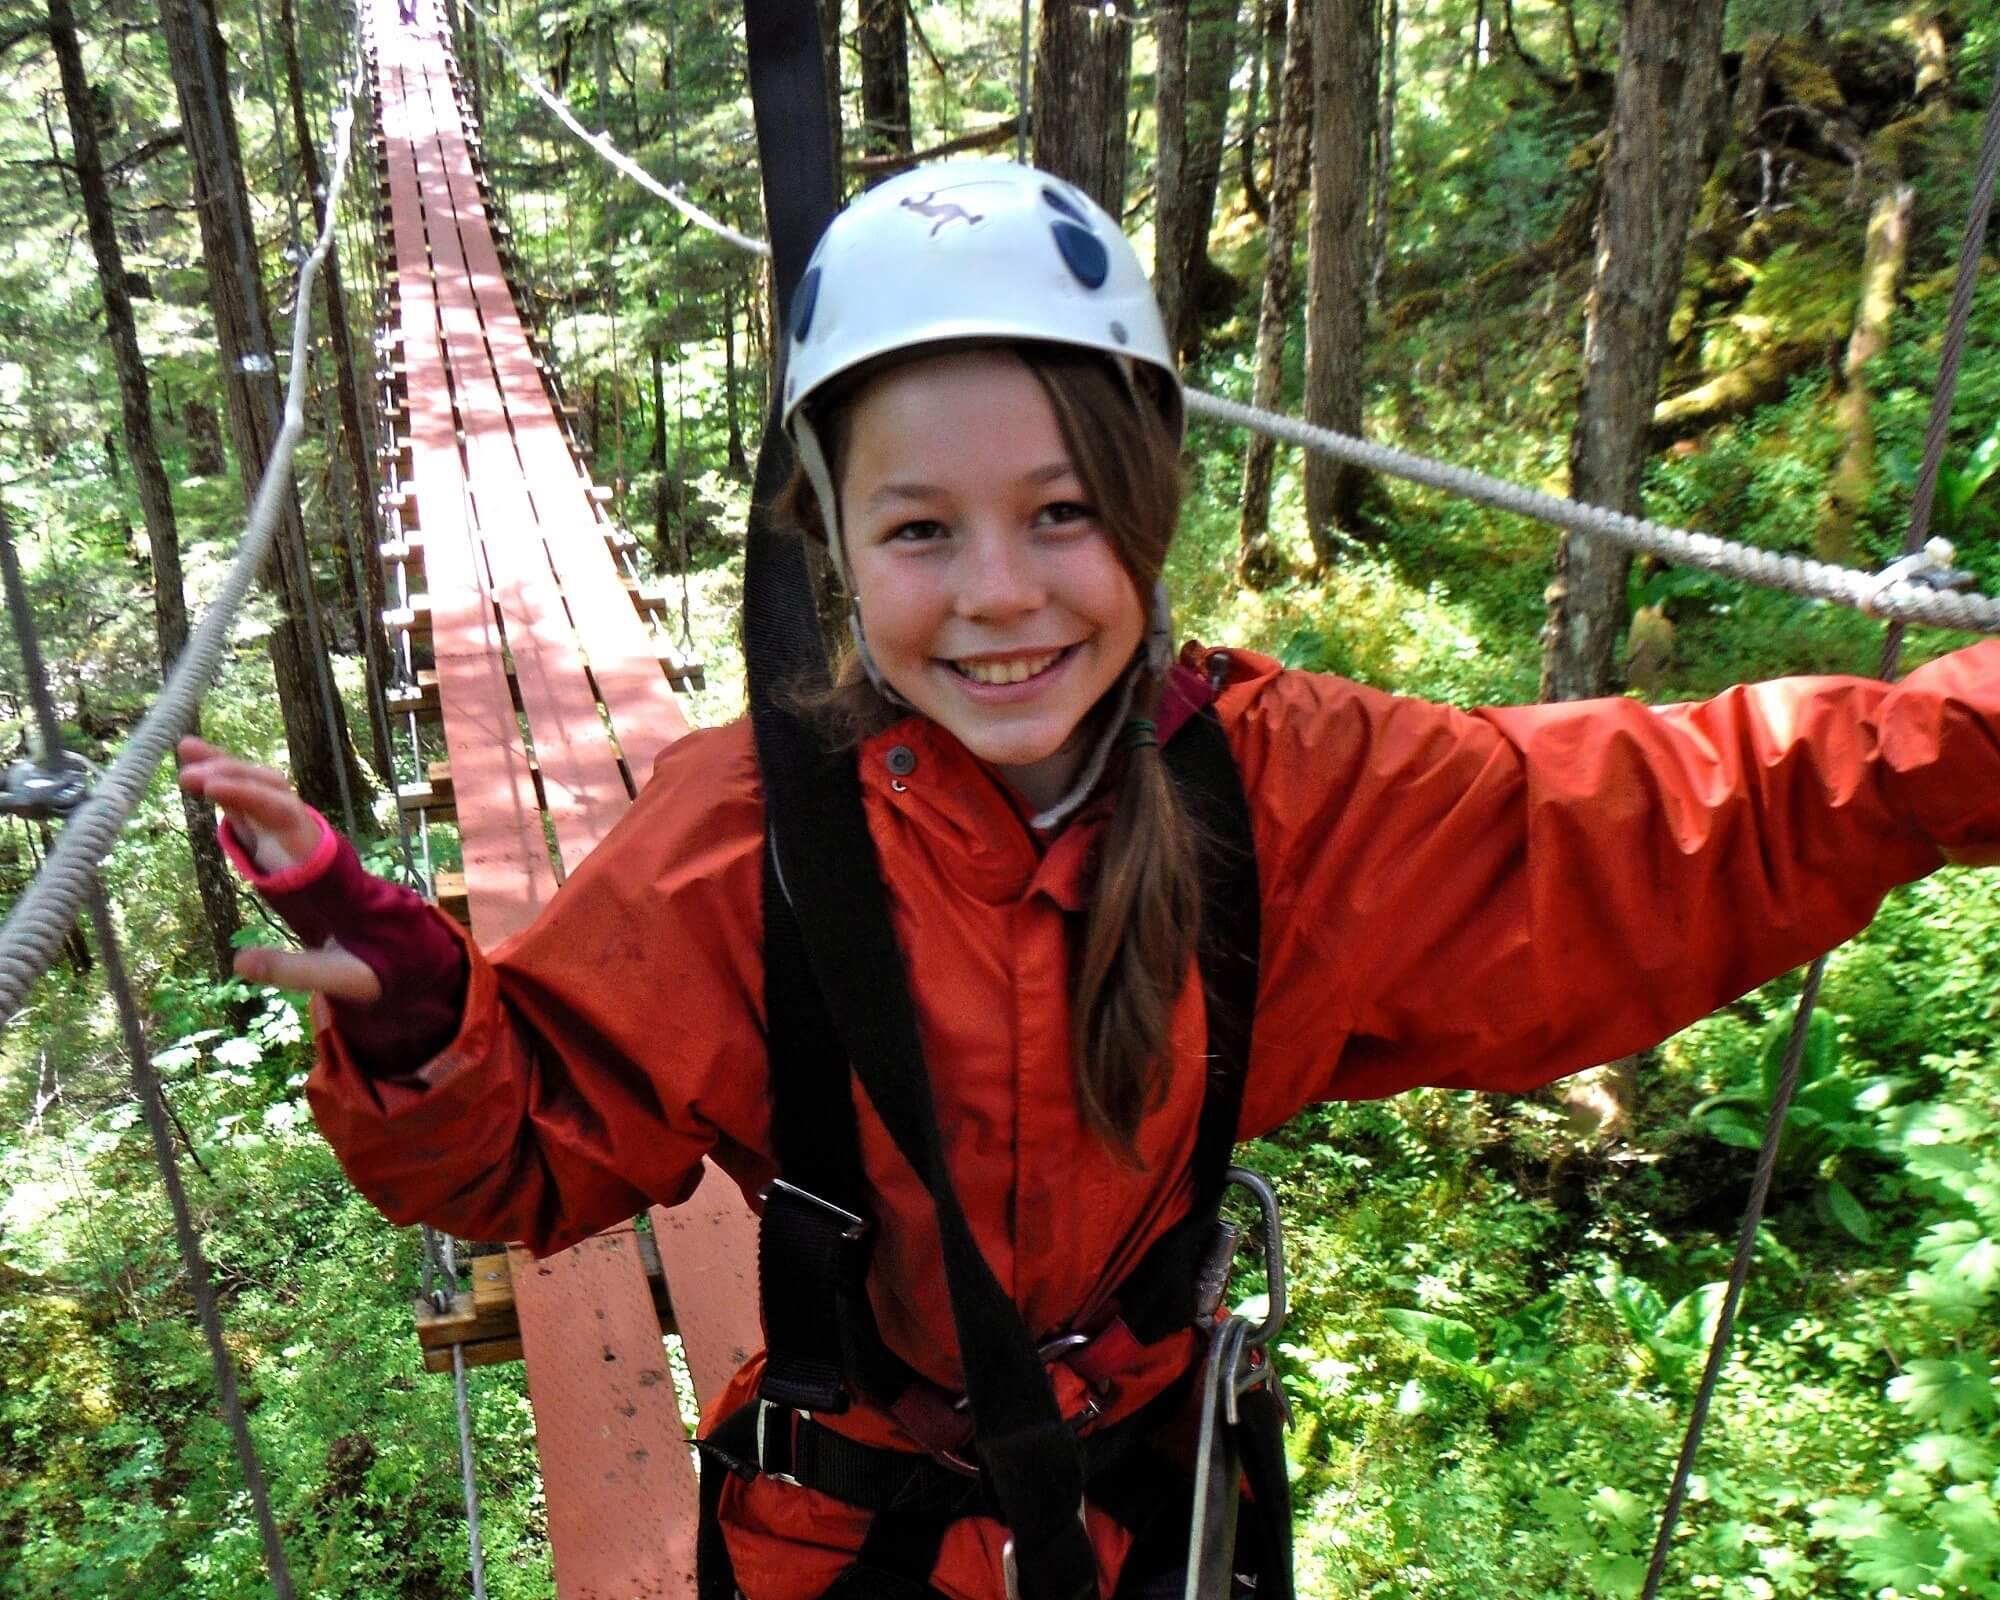 https://www.kawanti.com/wp-content/uploads/2018/10/Juneau-zip-Girl-crossing-Bridge.jpg